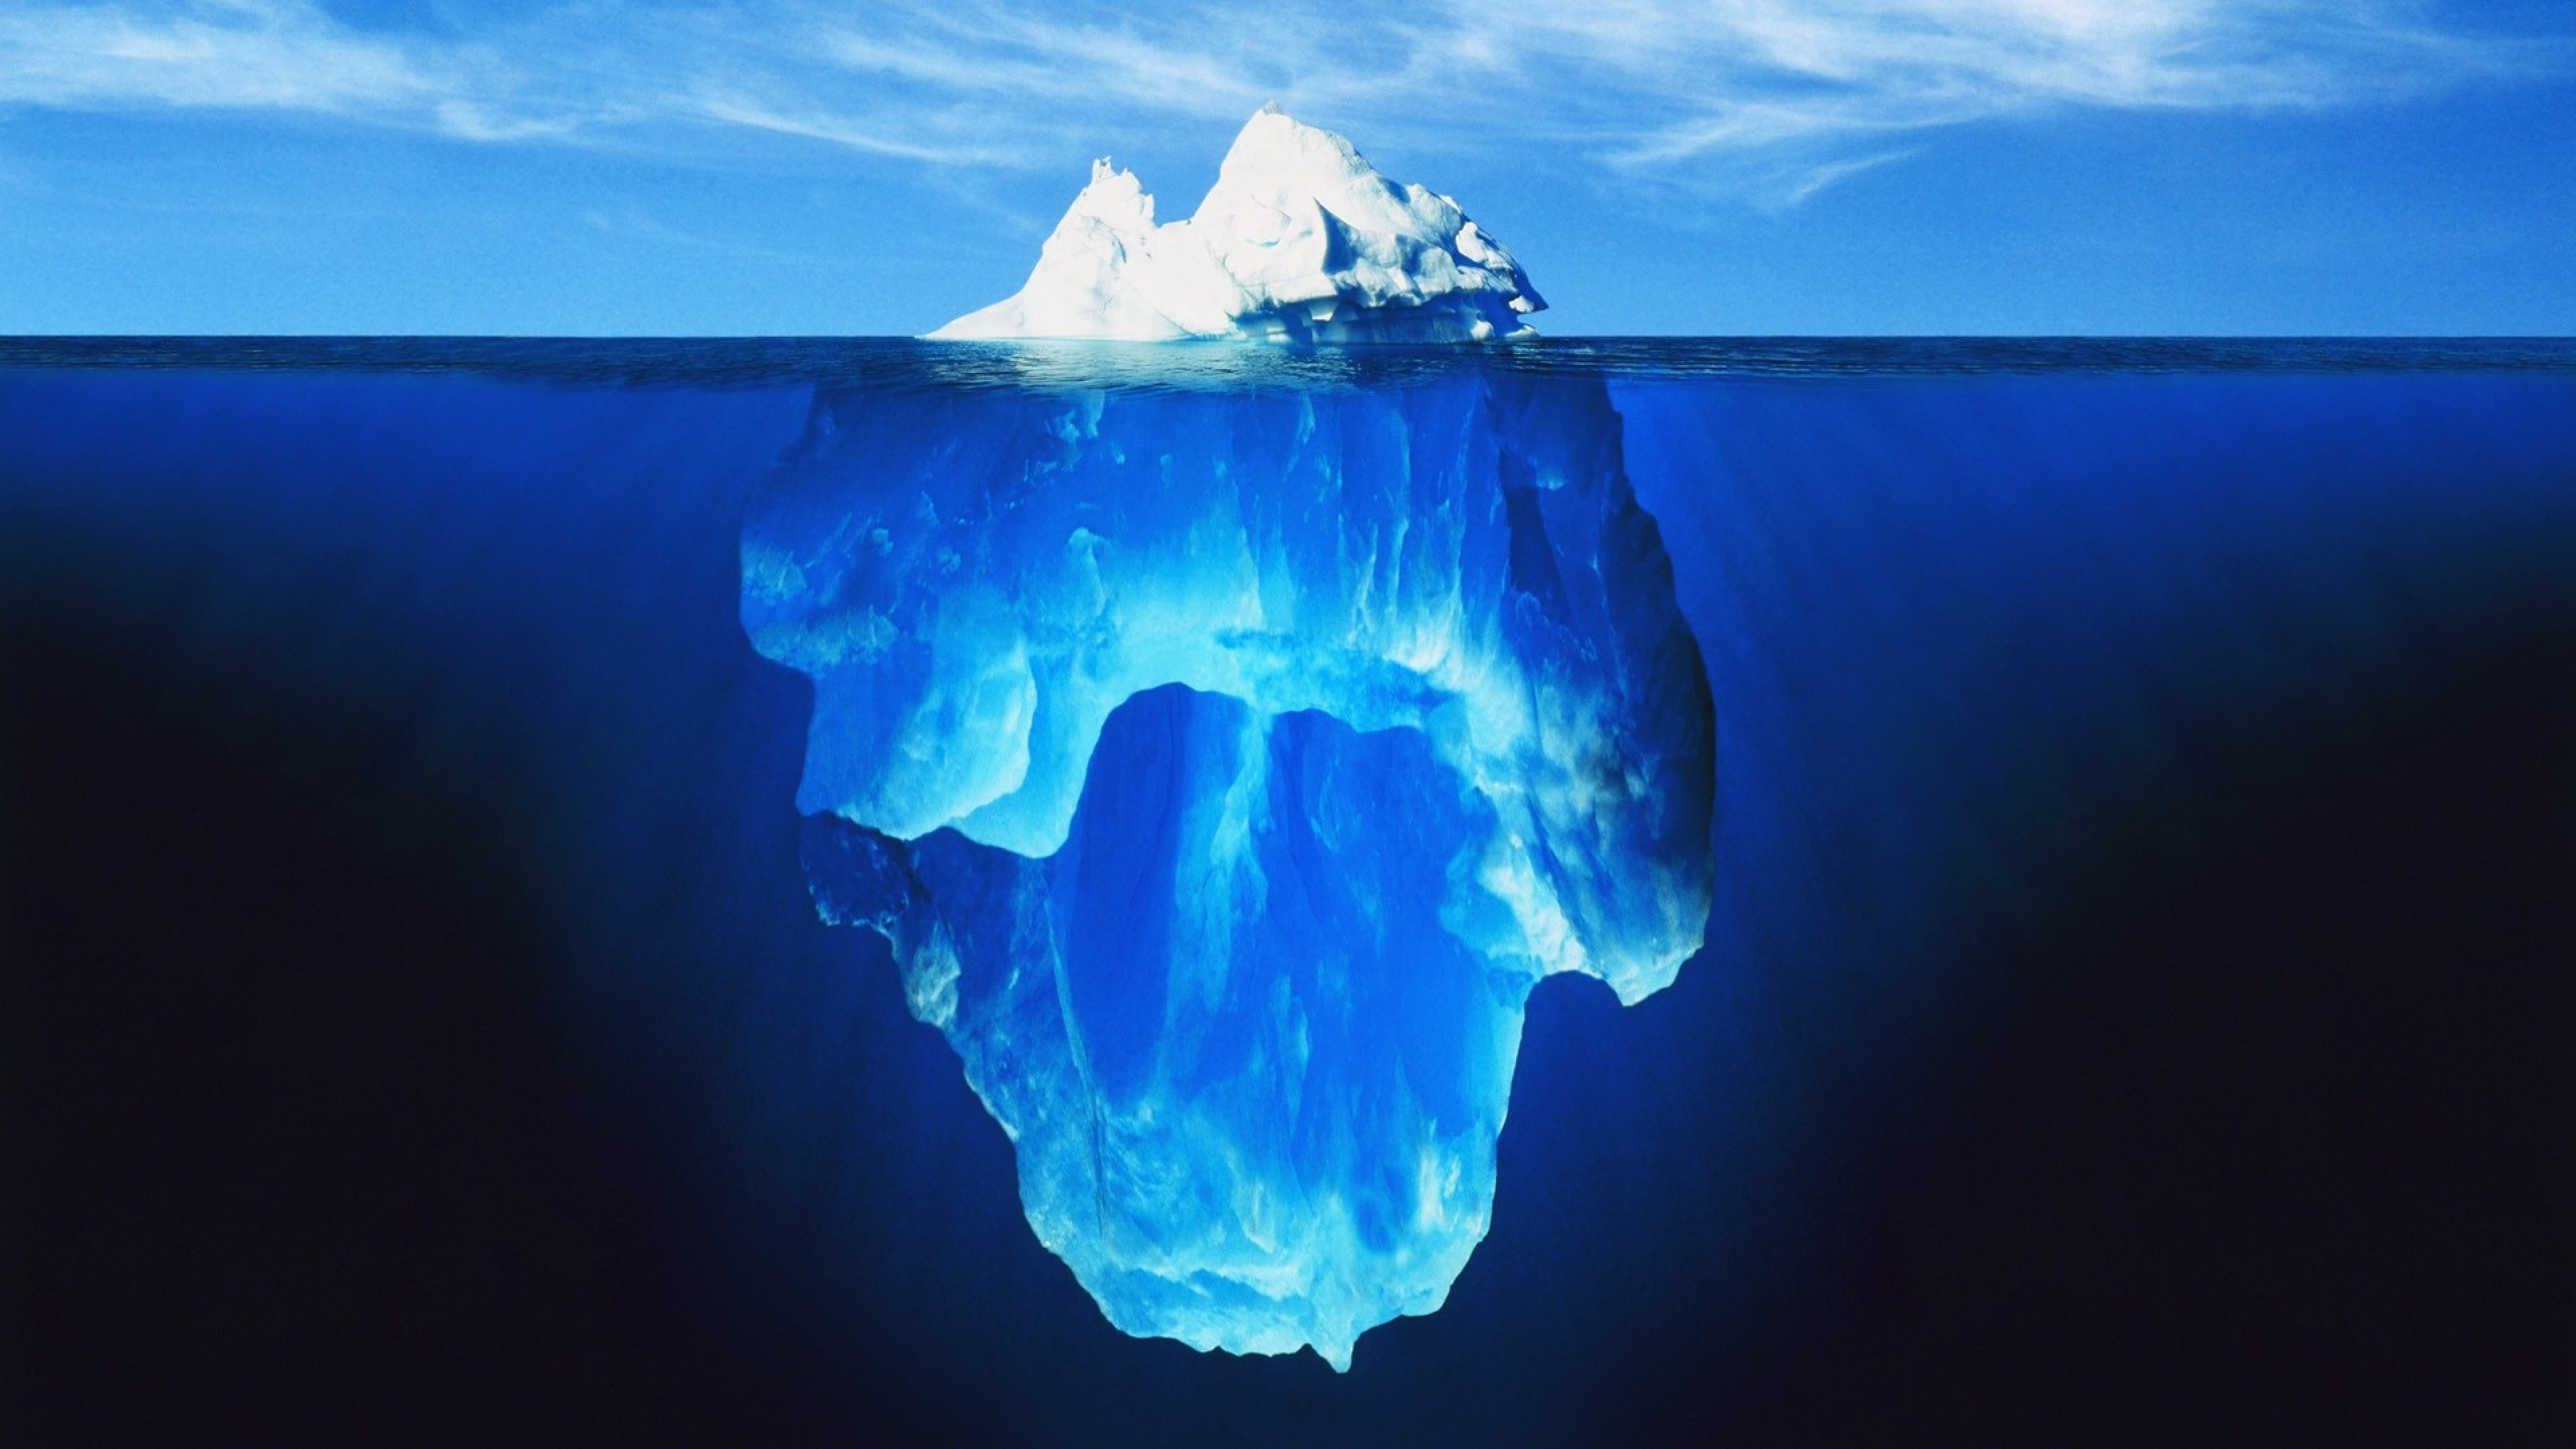 iceberg-underwater-wallpaper-wallpaper-1